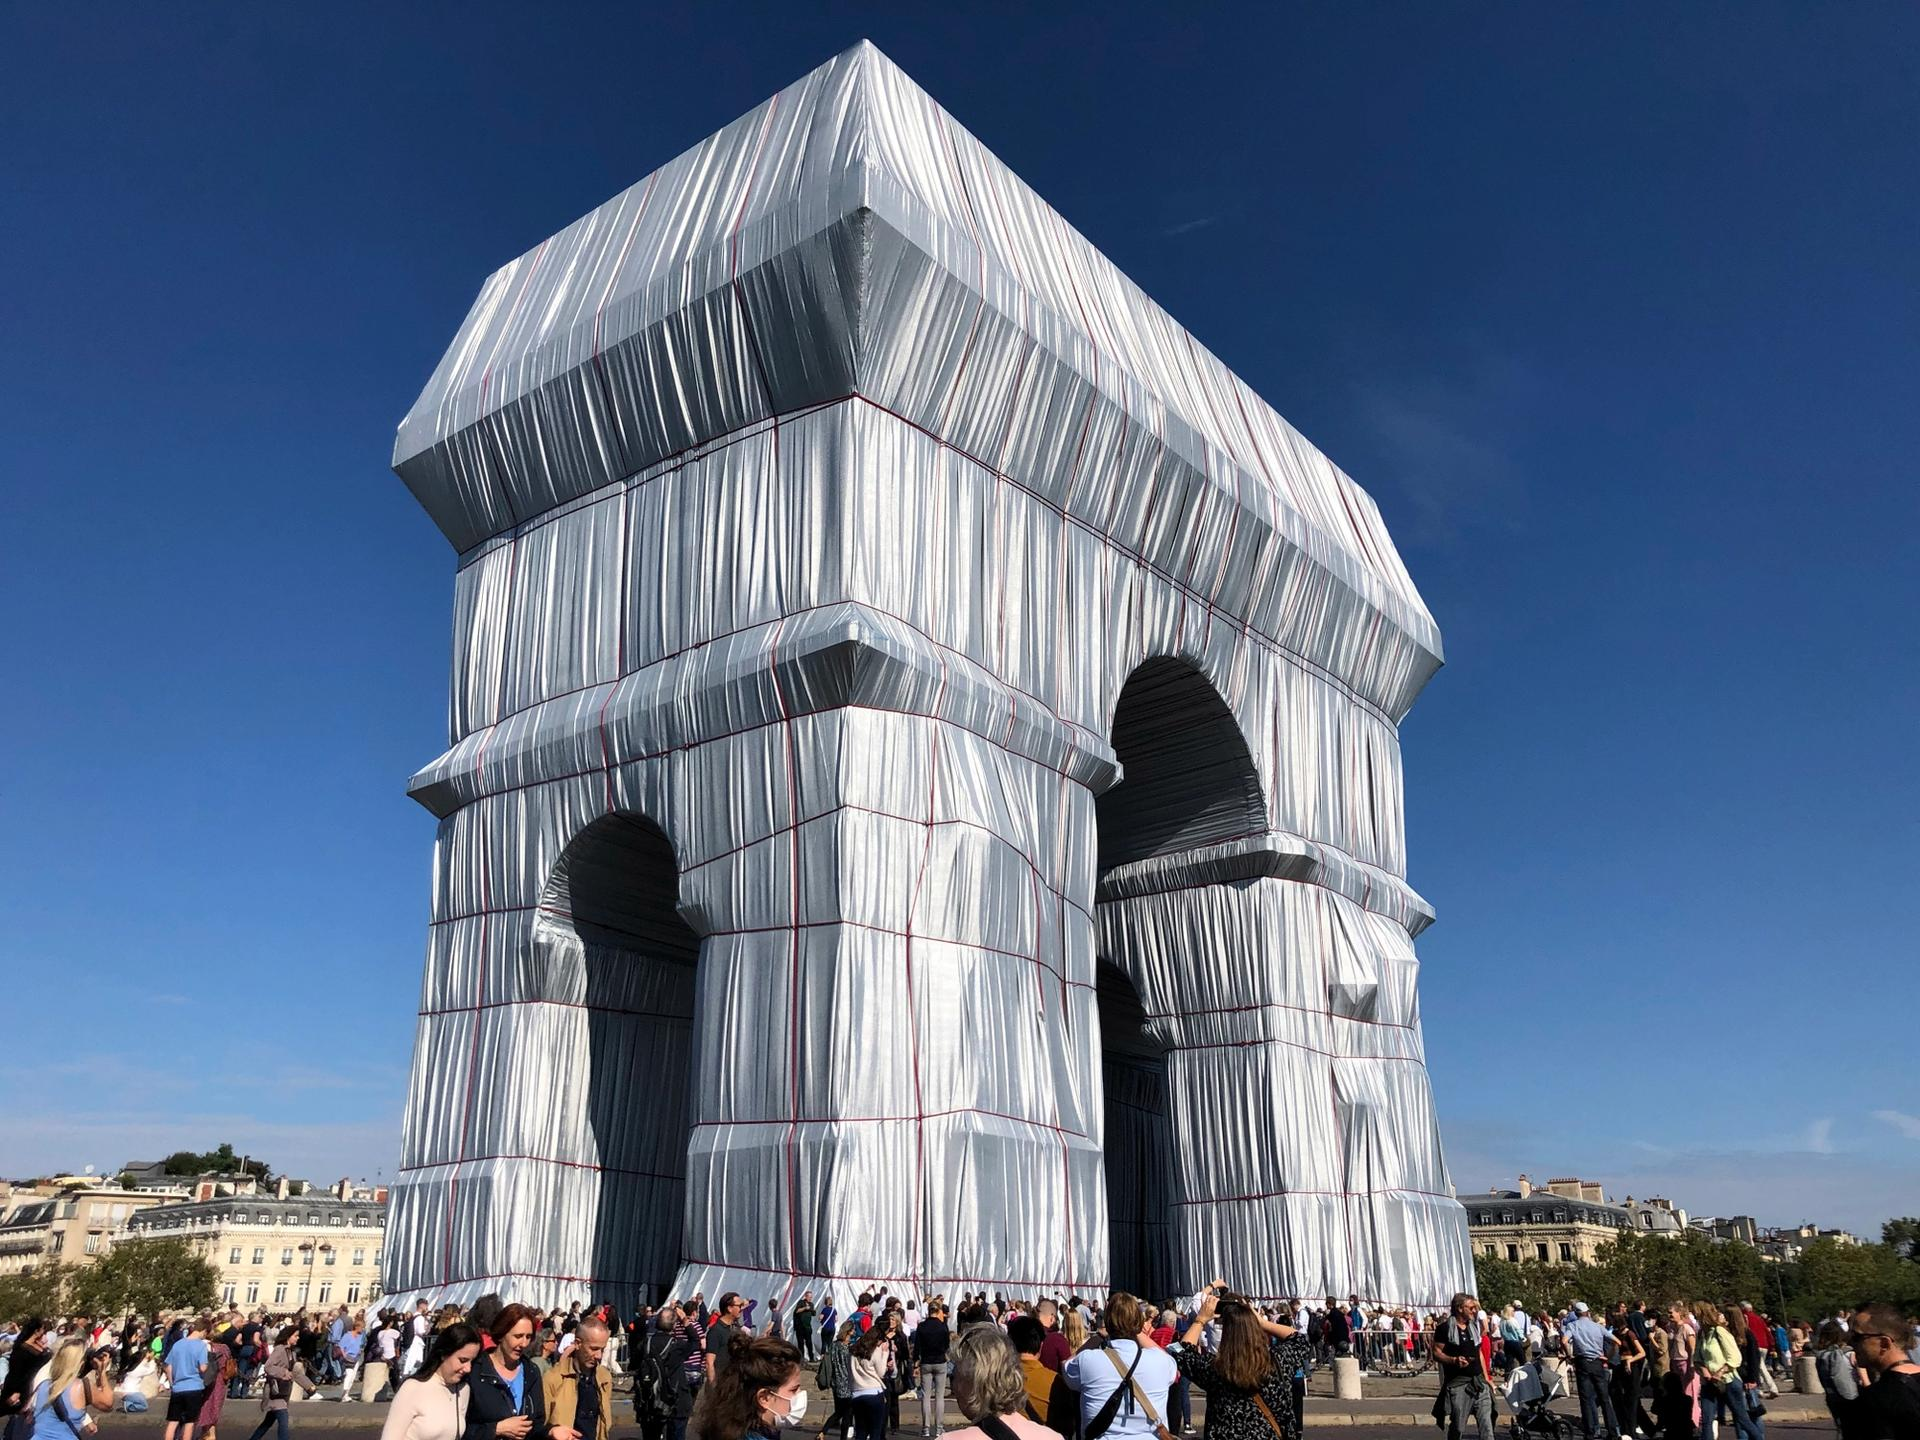 Christo and Jeanne-Claude's L'Arc de Triomphe, Wrapped in Paris Photo: Ben Luke